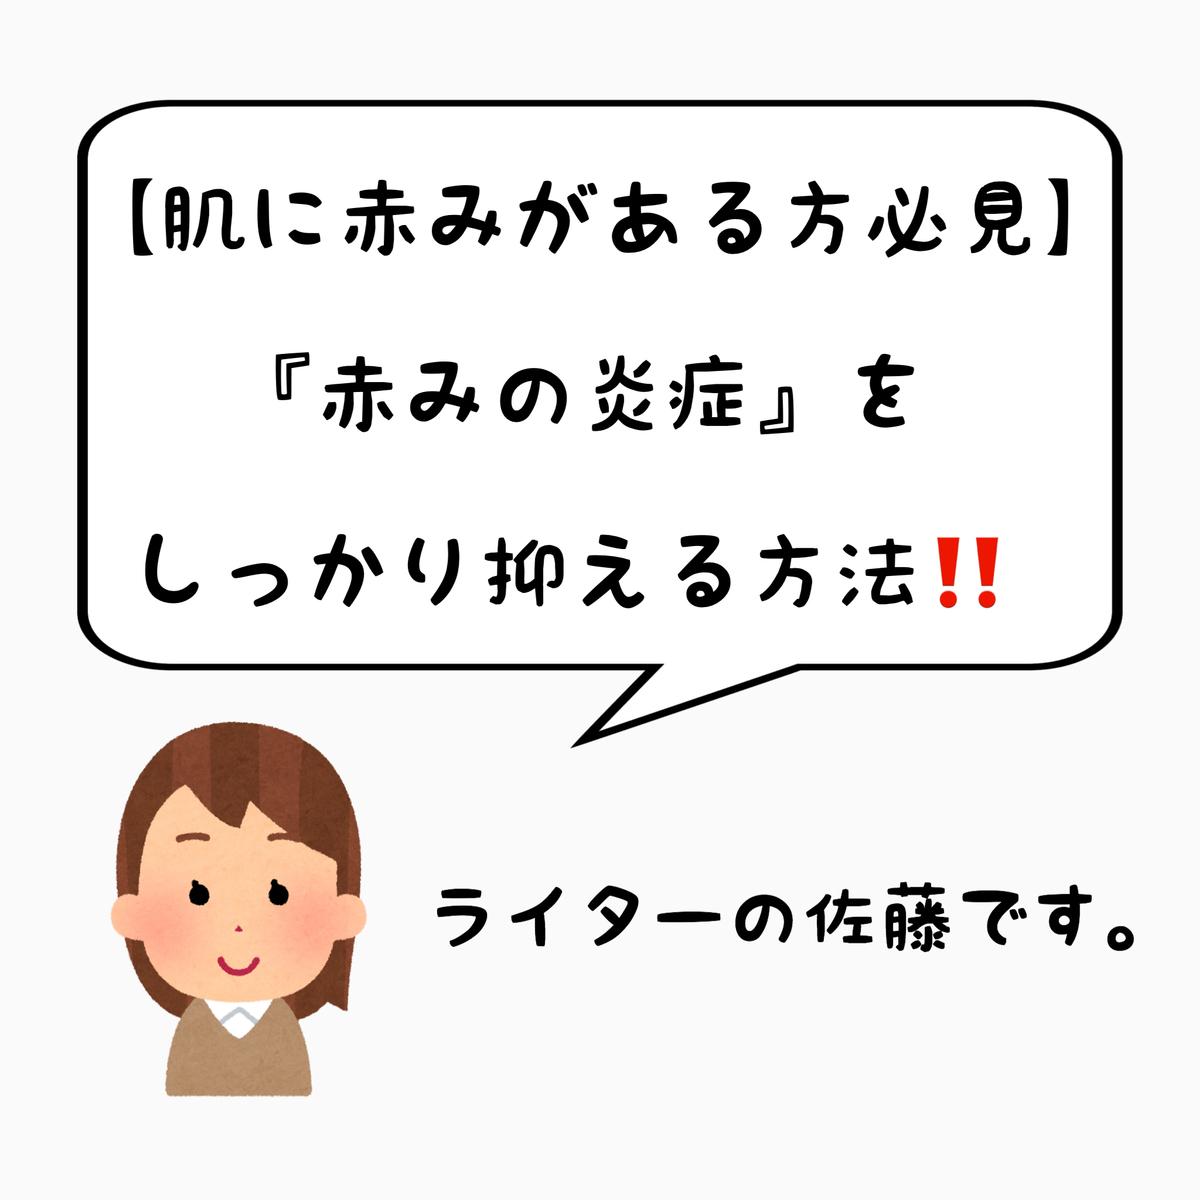 f:id:nokonoko_o:20201128144655j:plain